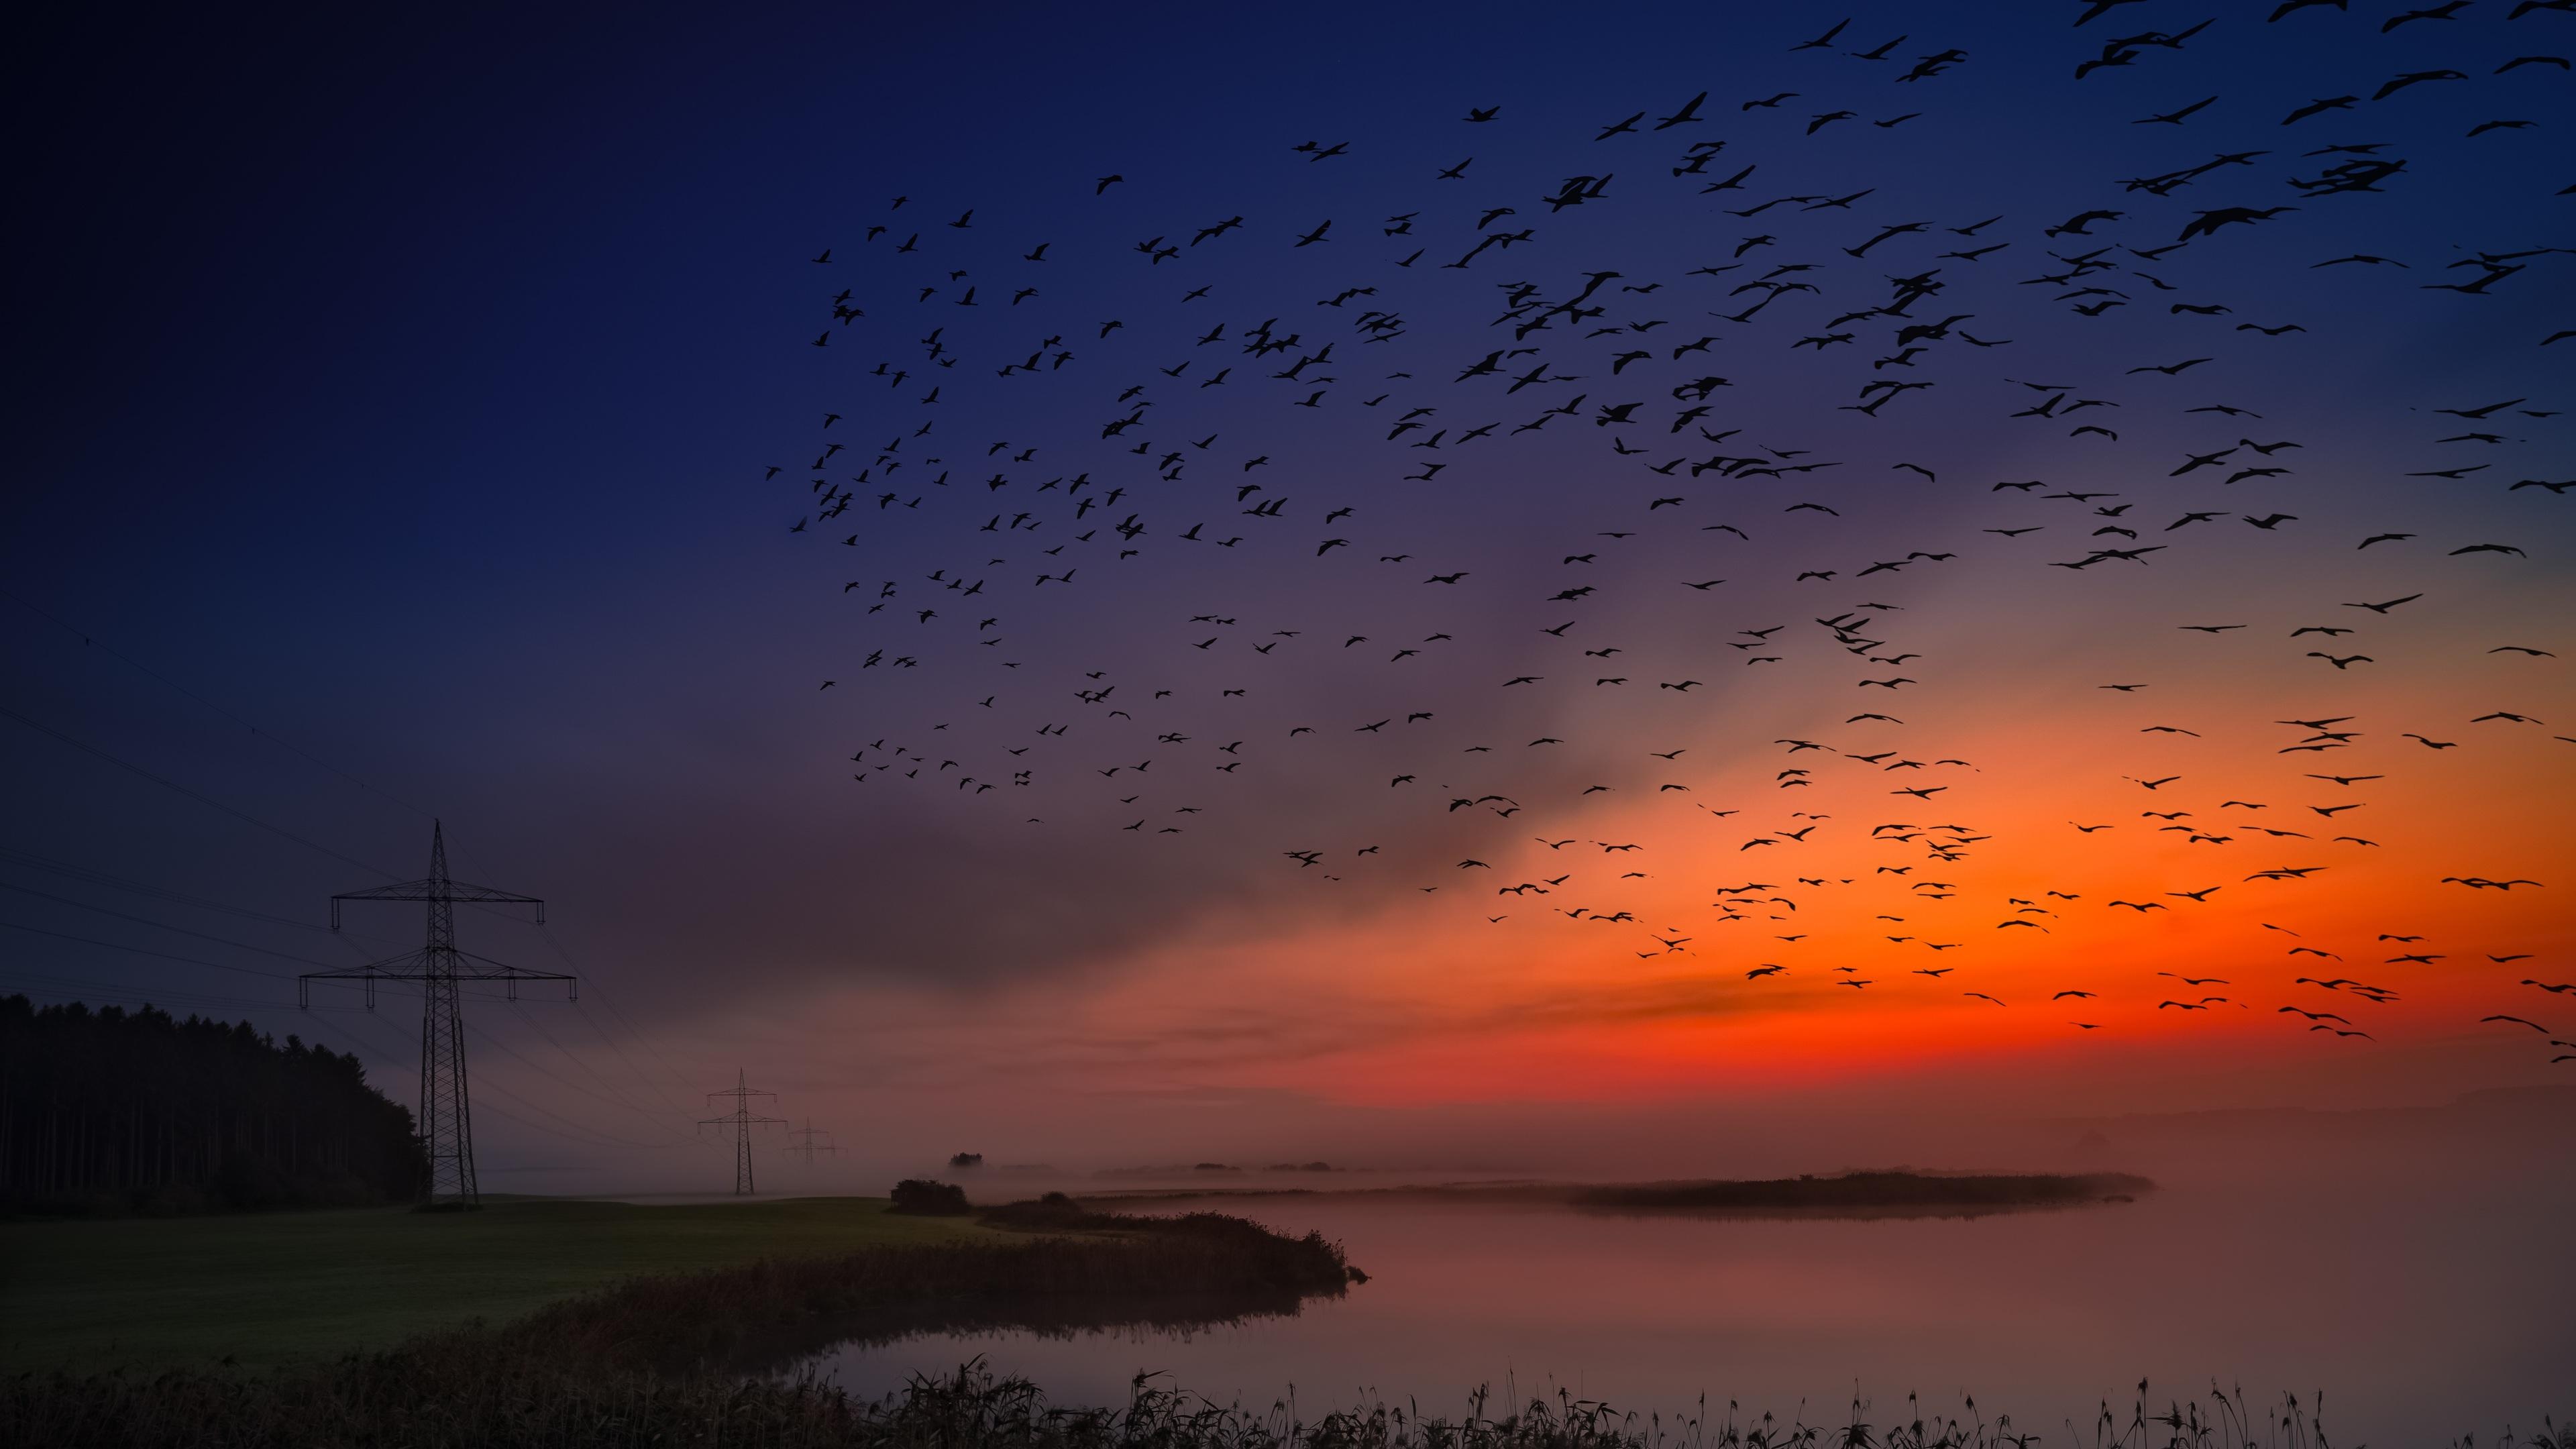 sunrise birds flight 4k 1540134131 - Sunrise Birds Flight 4k - sunrise wallpapers, nature wallpapers, hd-wallpapers, birds wallpapers, 5k wallpapers, 4k-wallpapers